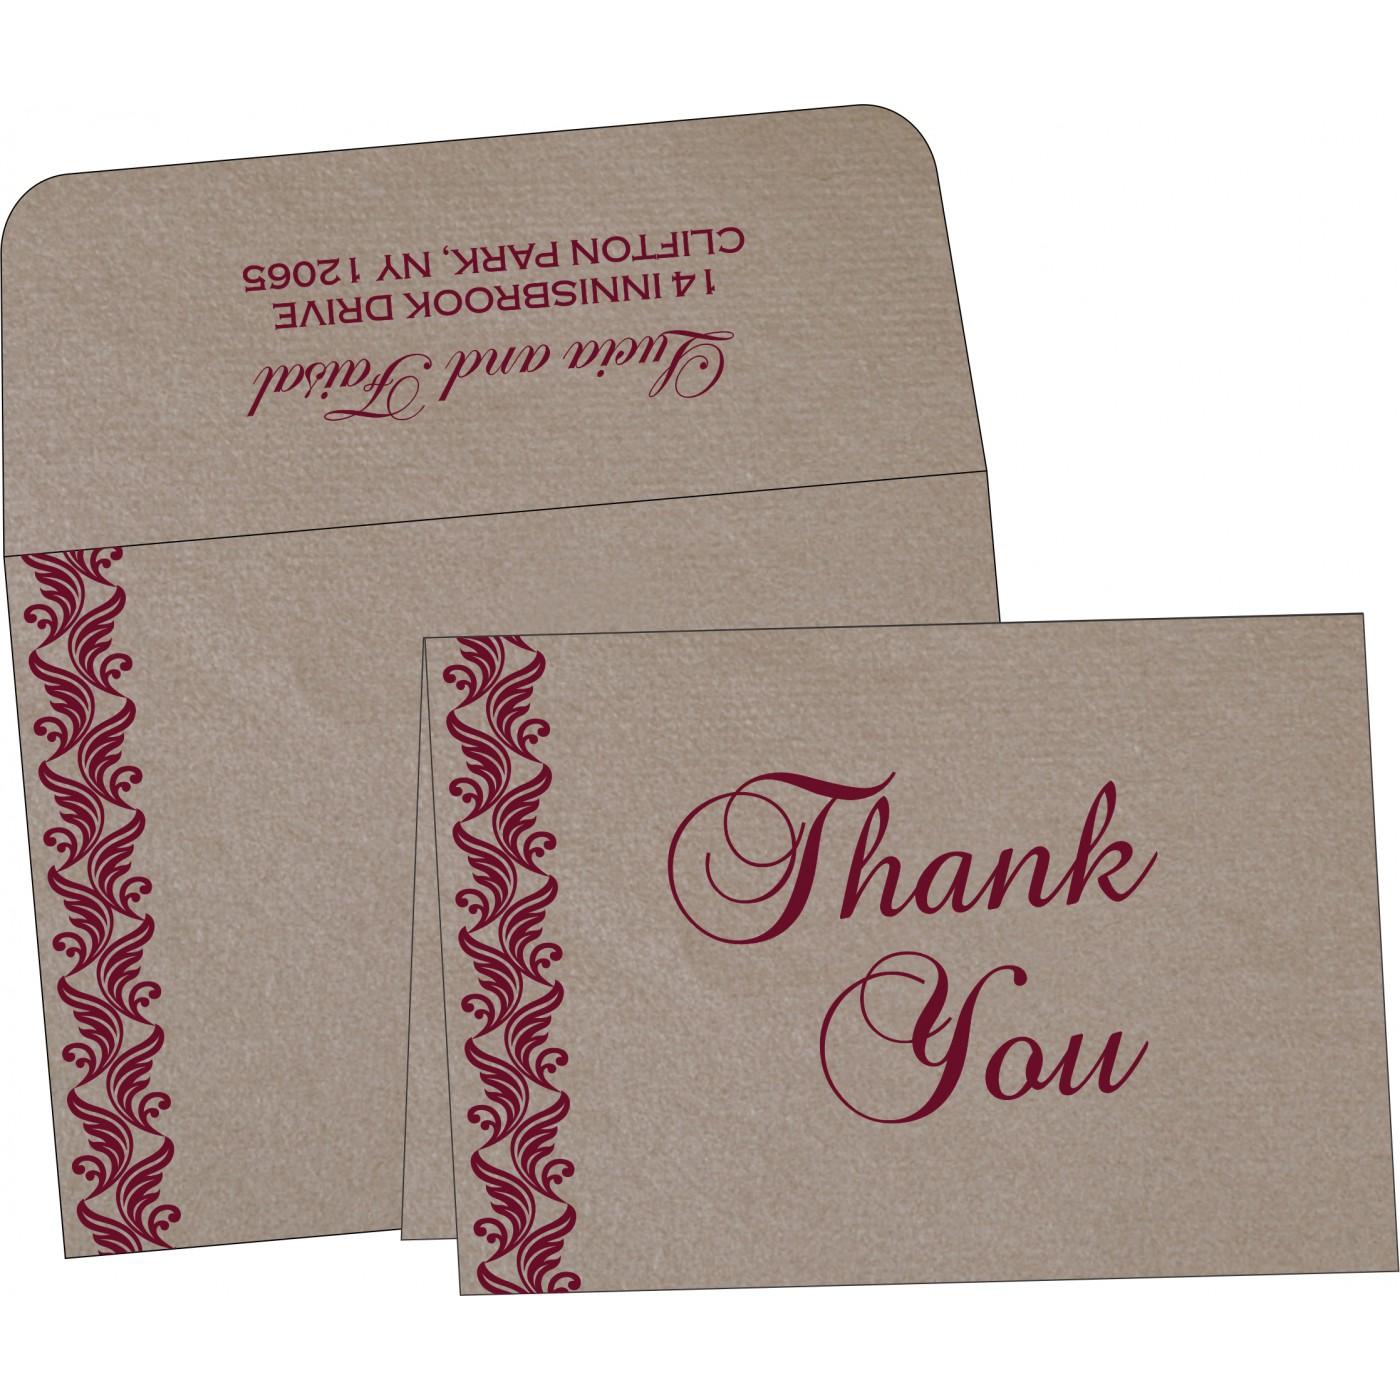 Thank You Cards : TYC-5007A - 123WeddingCards